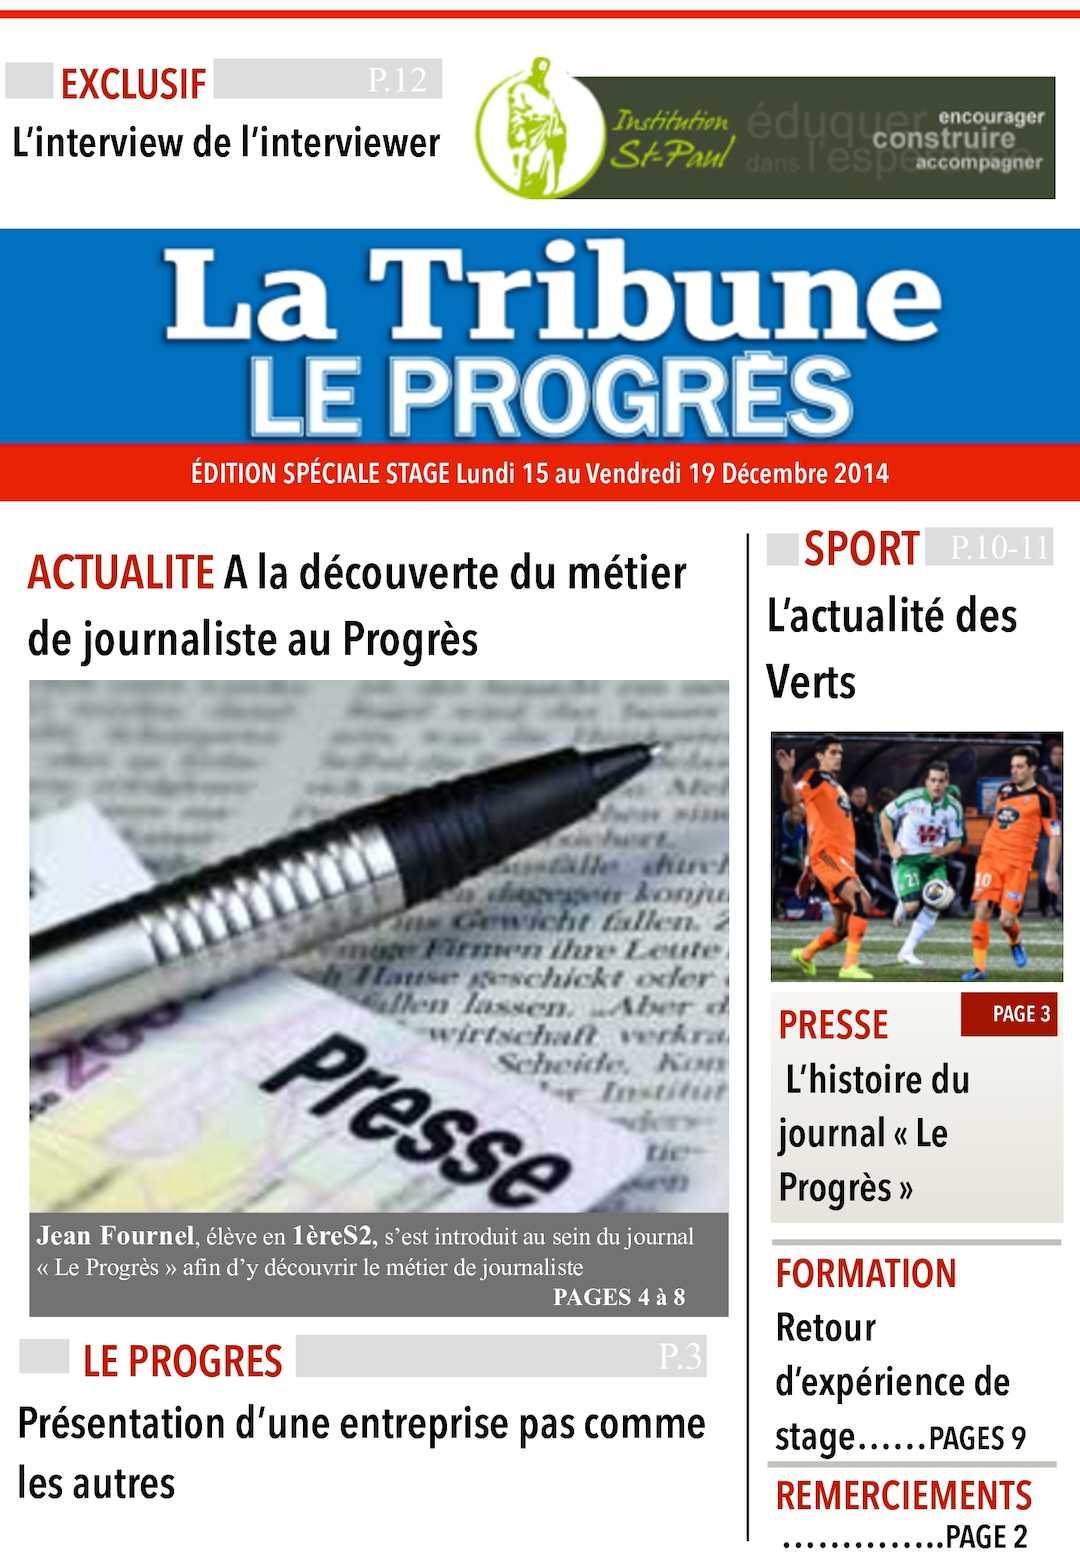 Calaméo - Maquette Journal Pdf